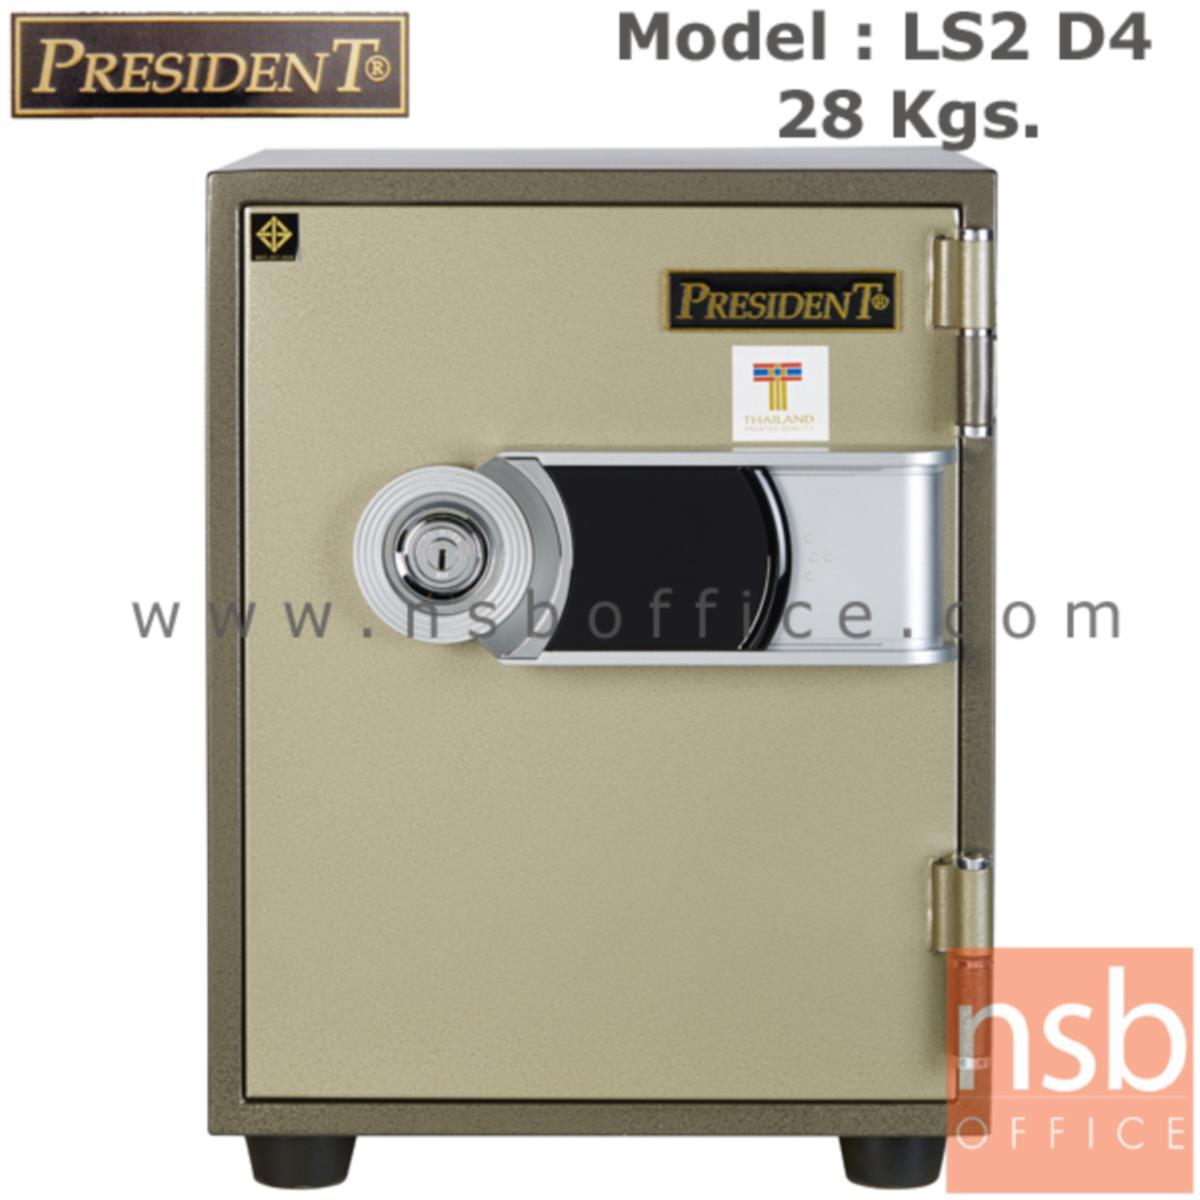 F05A069:ตู้เซฟนิรภัยชนิดดิจิตอลแบบใหม่ 28 กก. รุ่น PRESIDENT-LS2D4 มี 1 กุญแจ 1 รหัส (รหัสใช้กดหน้าตู้)